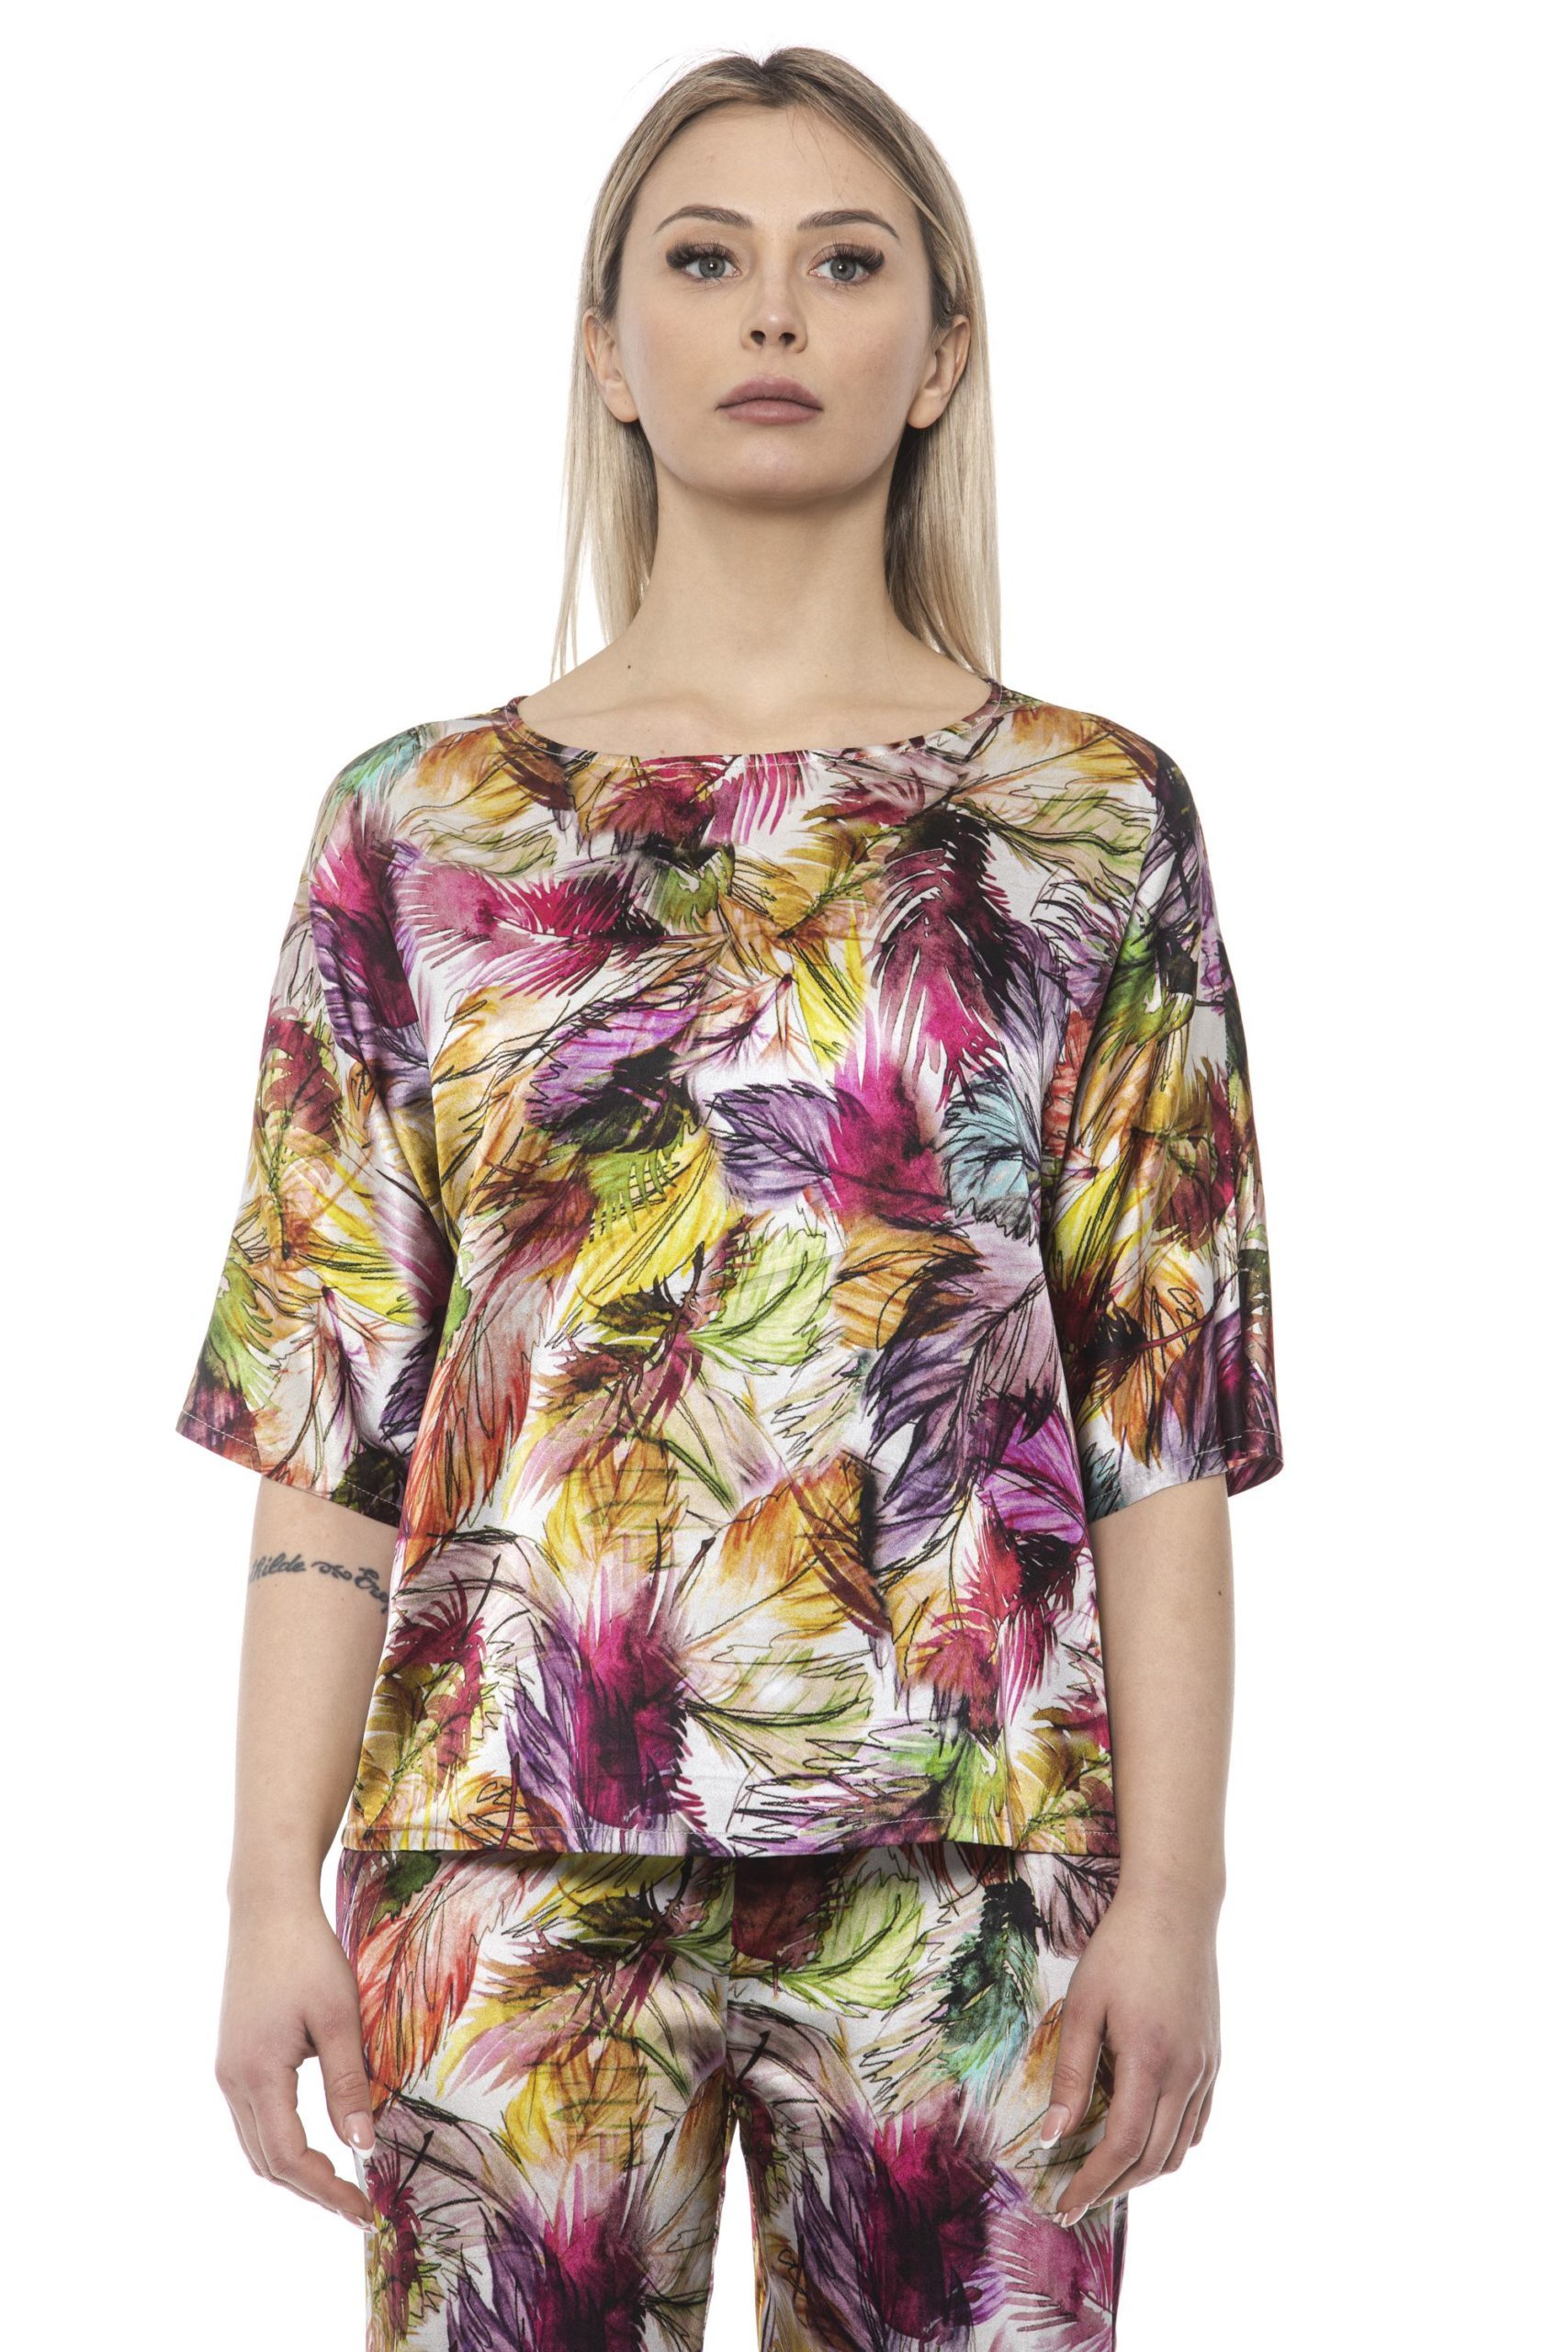 Alpha Studio Women's V A R. U N I C A T-Shirt Multicolor AL1394941 - IT40 | XS